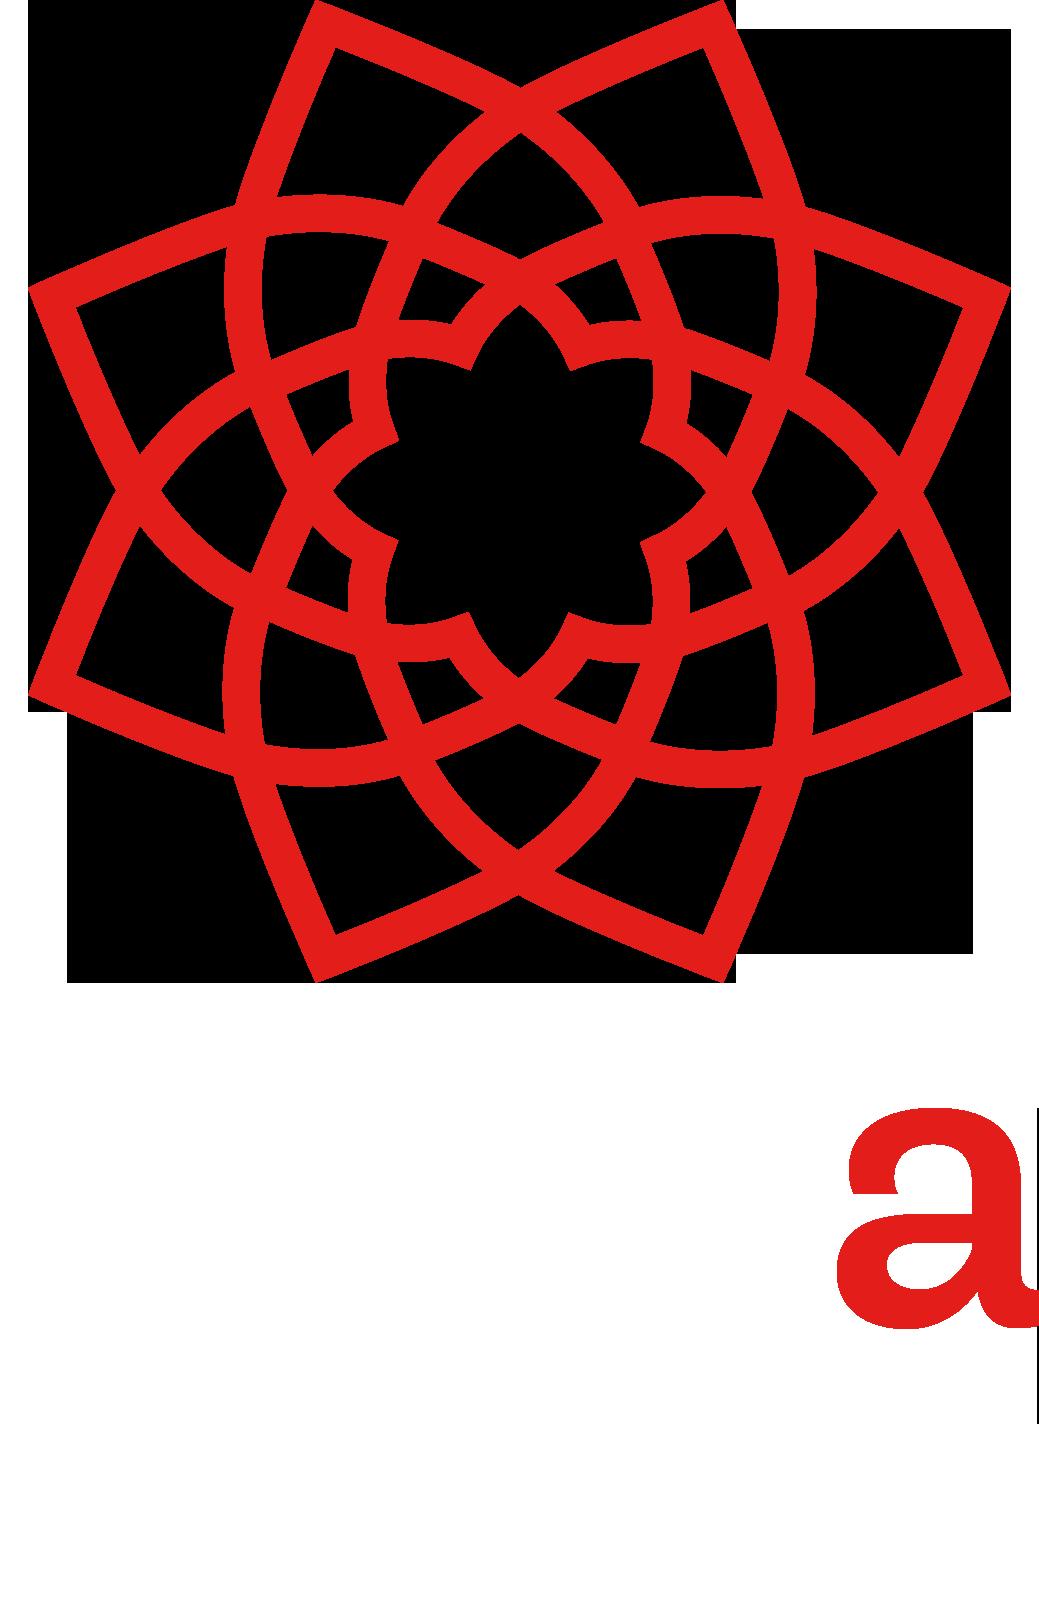 MOVA BATALHA